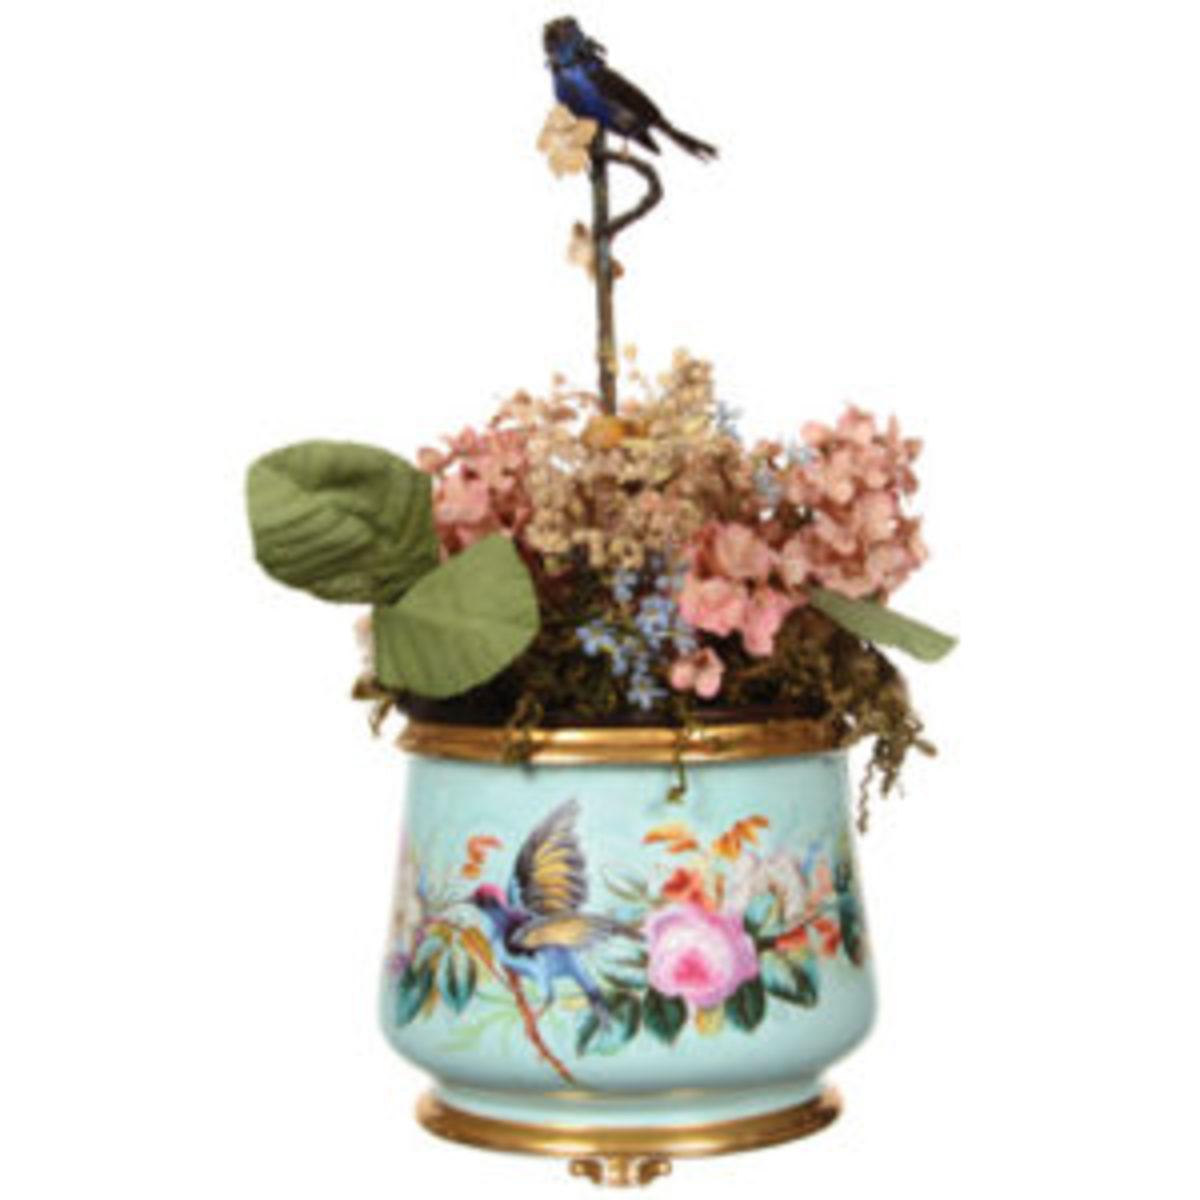 decorative arts: Old Paris porcelain mechanical ferner